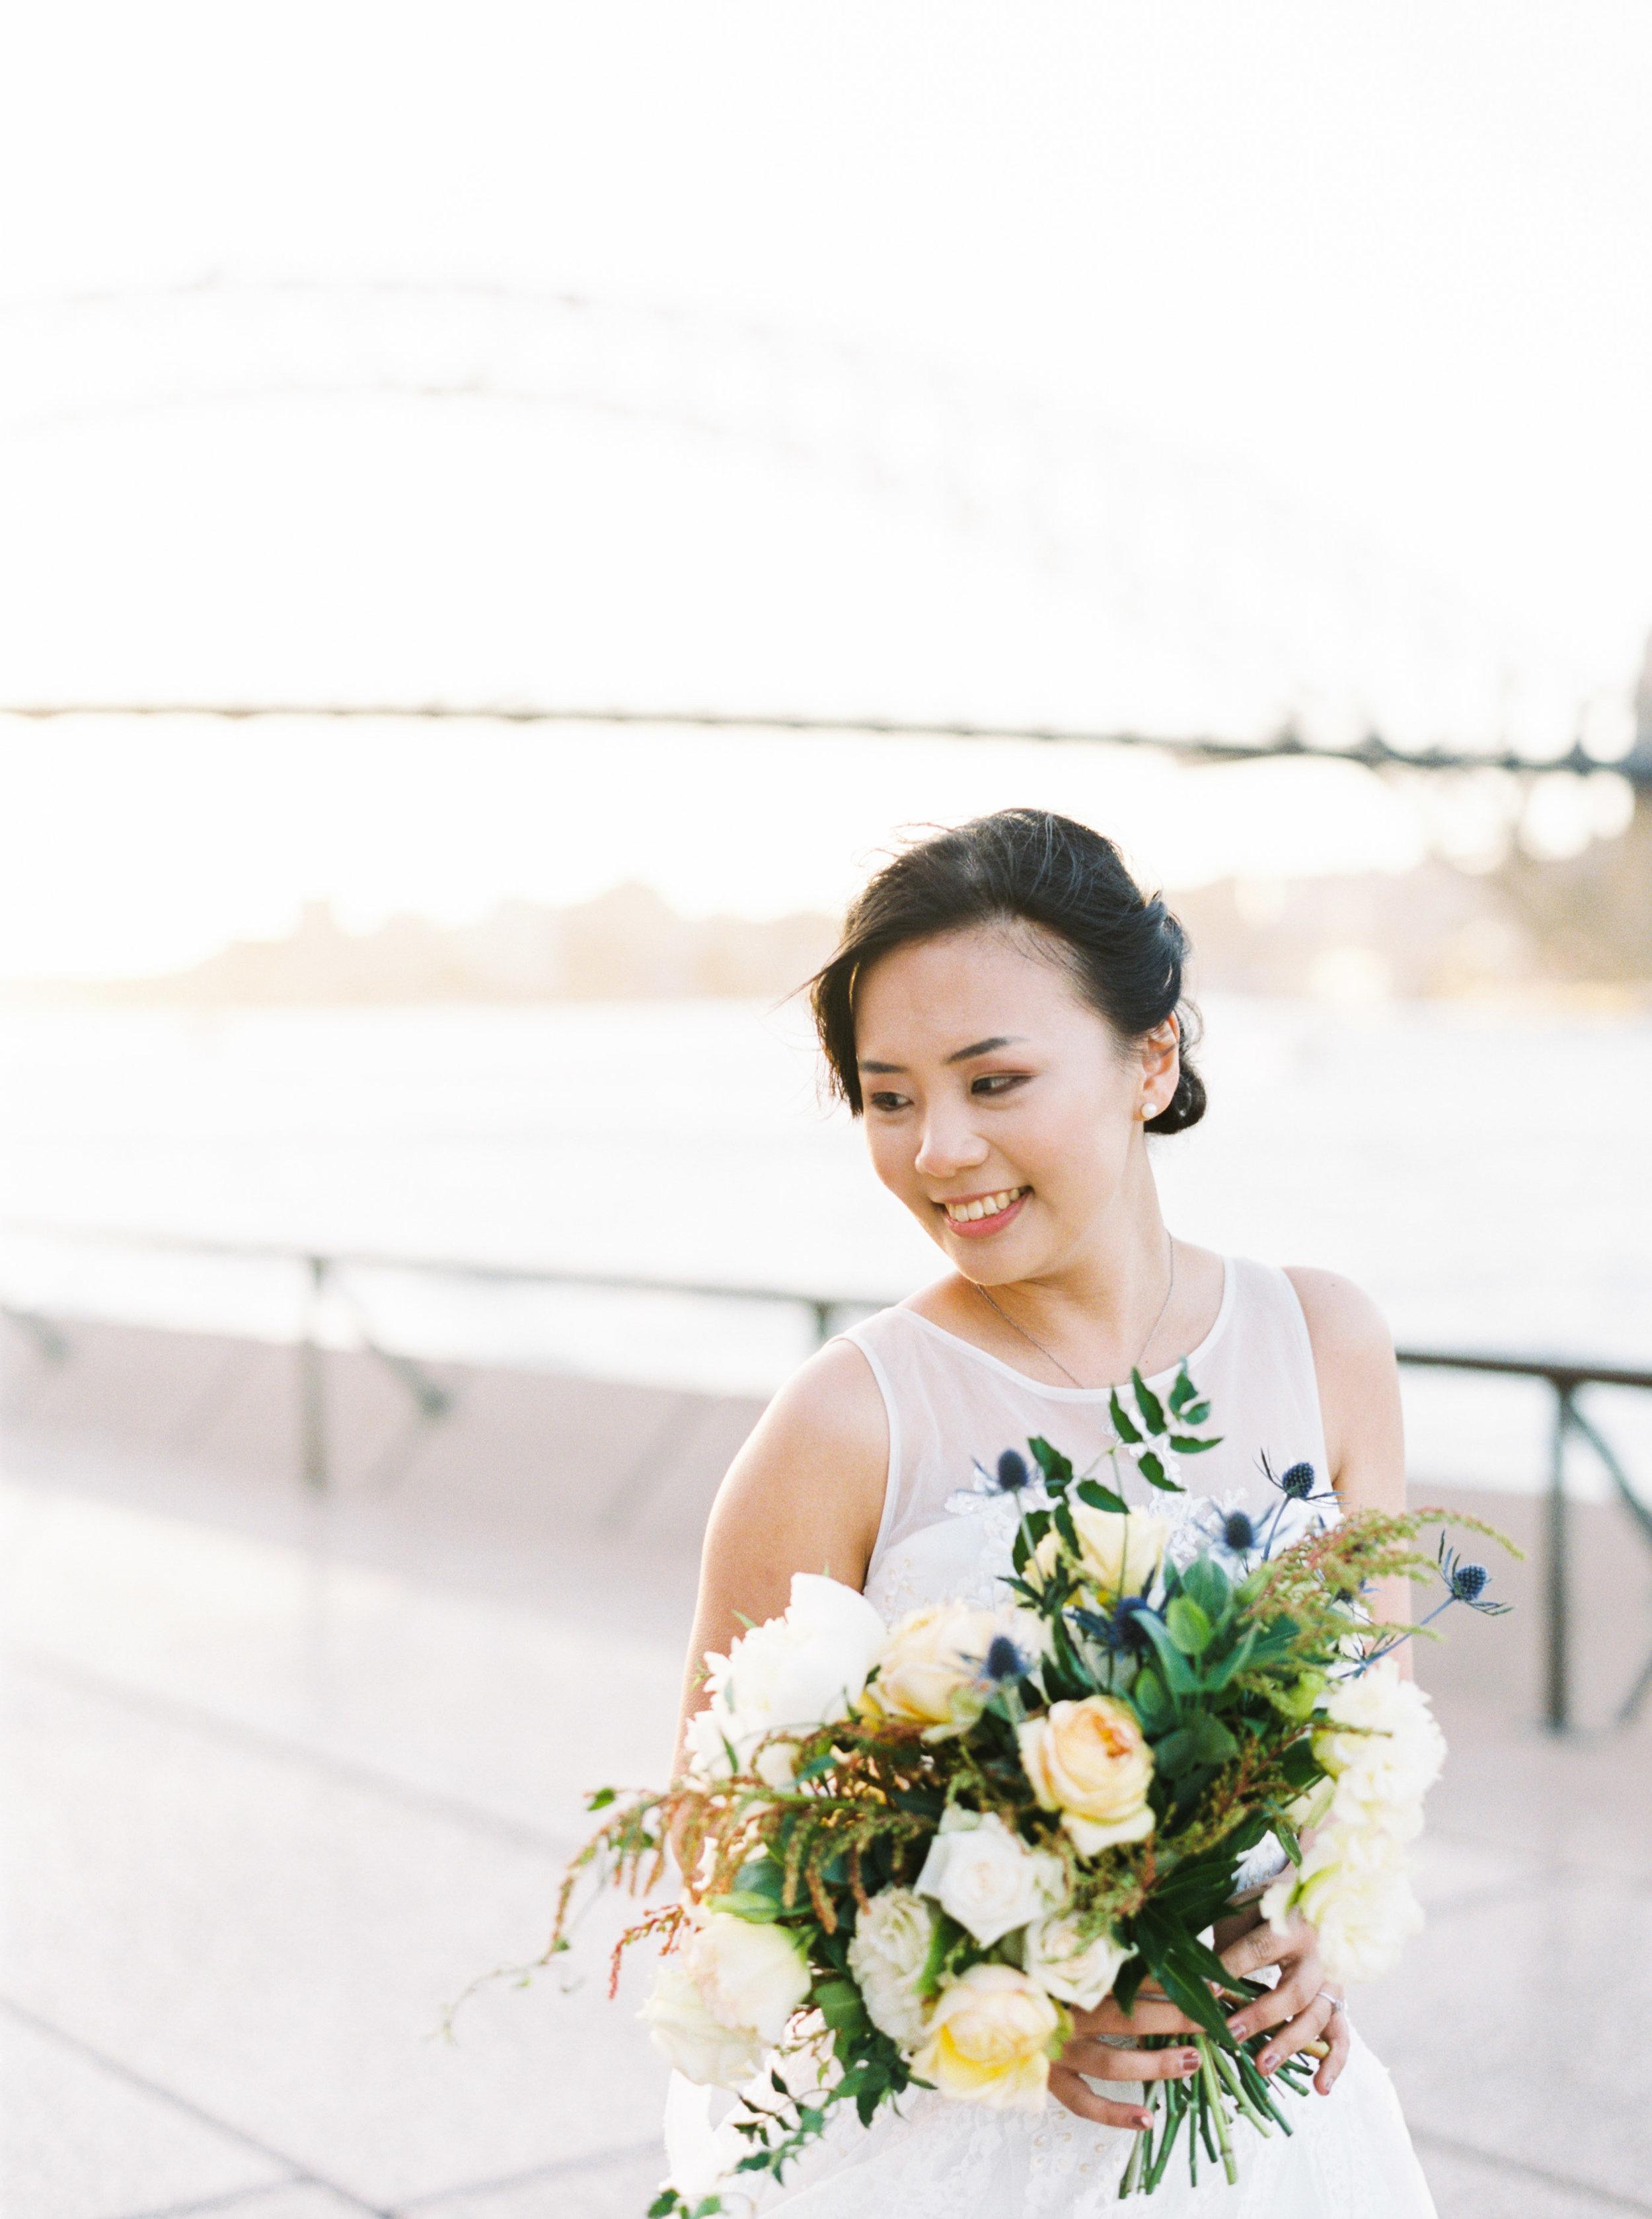 00036- Australia Sydney Wedding Photographer Sheri McMahon.jpg